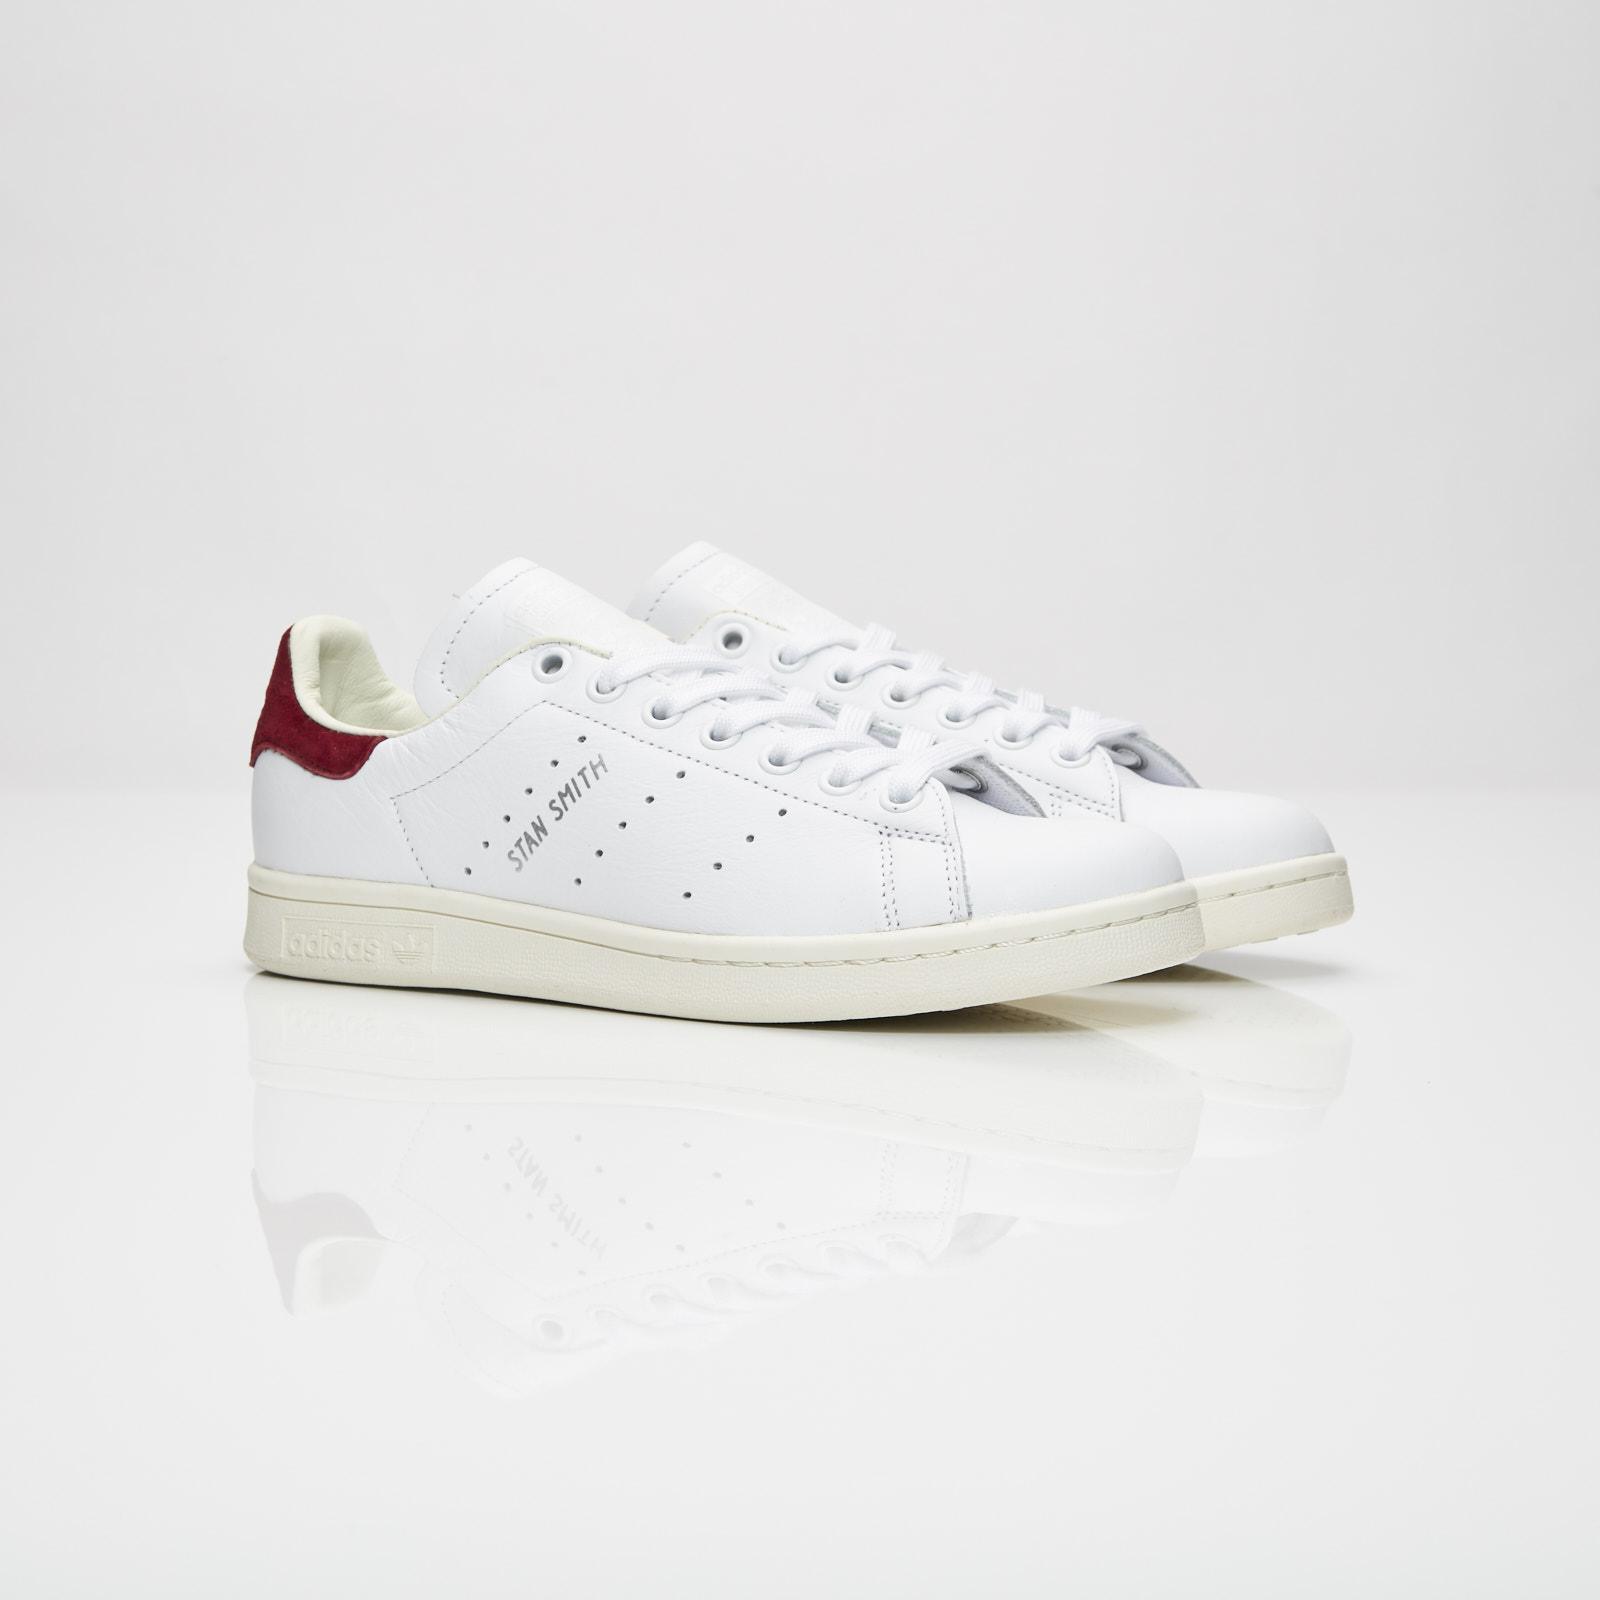 adidas Stan Smith W - Aq0887 - Sneakersnstuff  53fca36e82